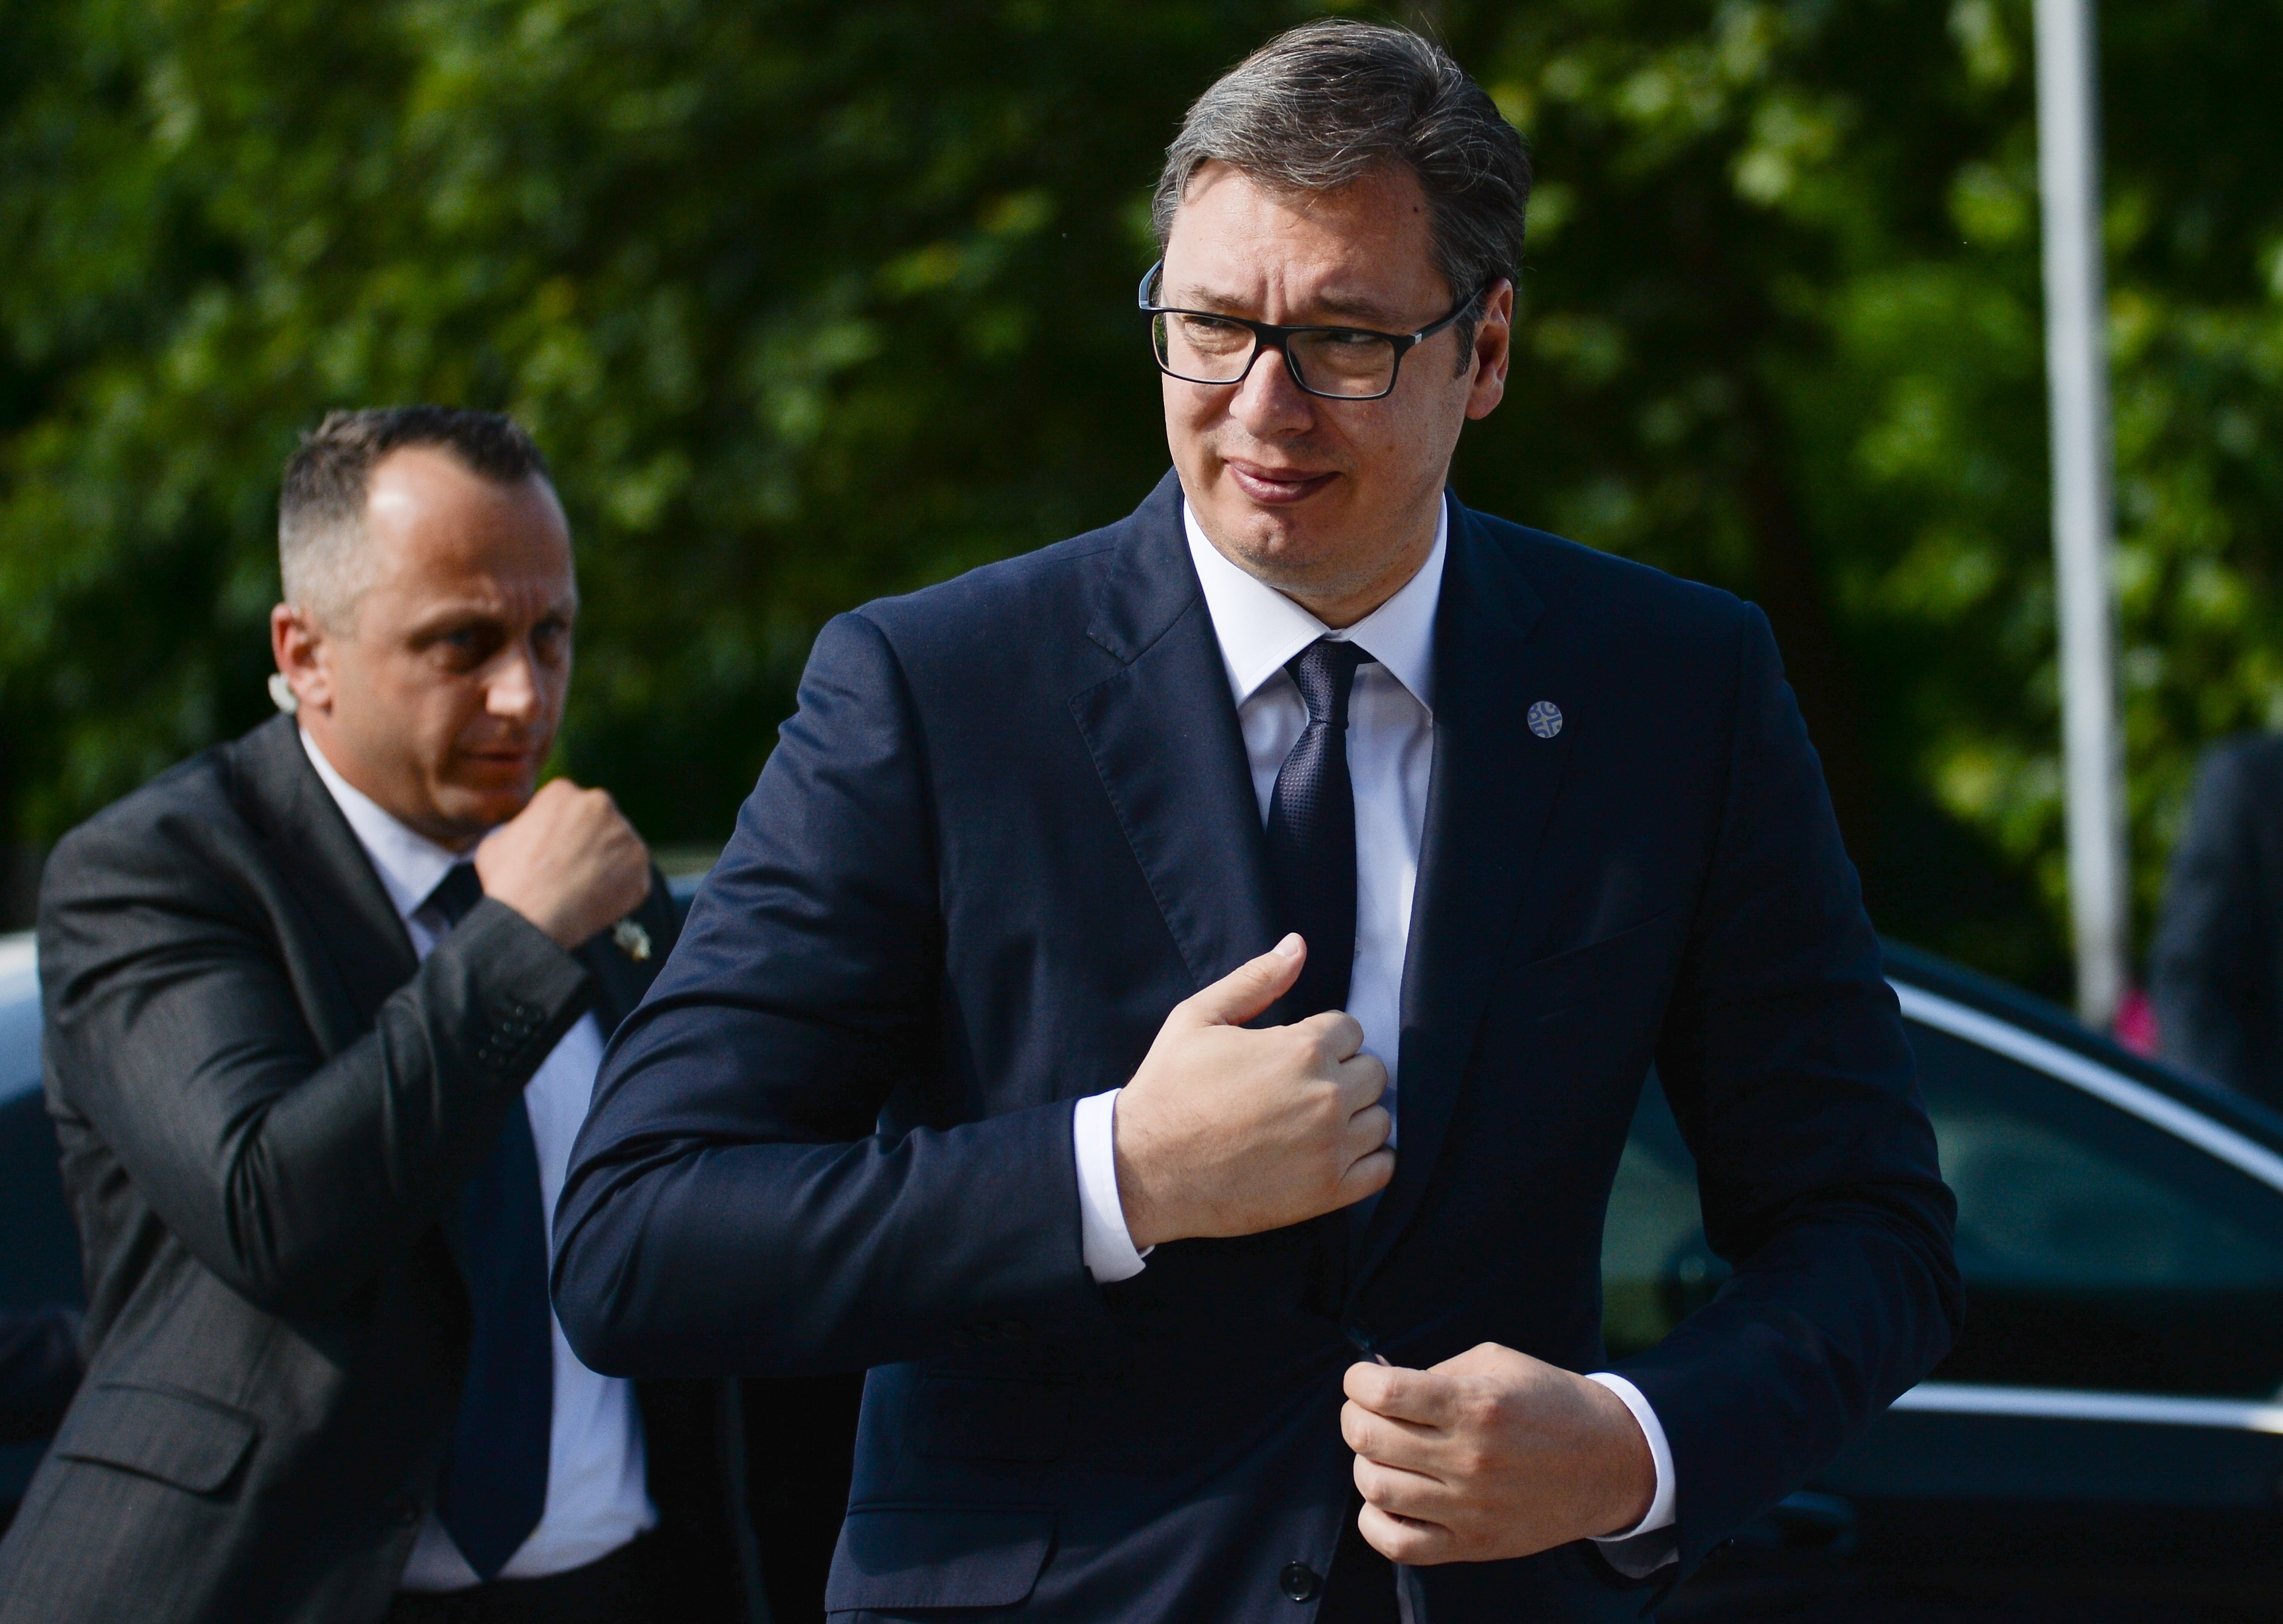 <p>Президент Сербии Александр Вучич.&nbsp;<span>Фото: &copy; РИА Новости/Алексей Витвицкий&nbsp;</span></p>